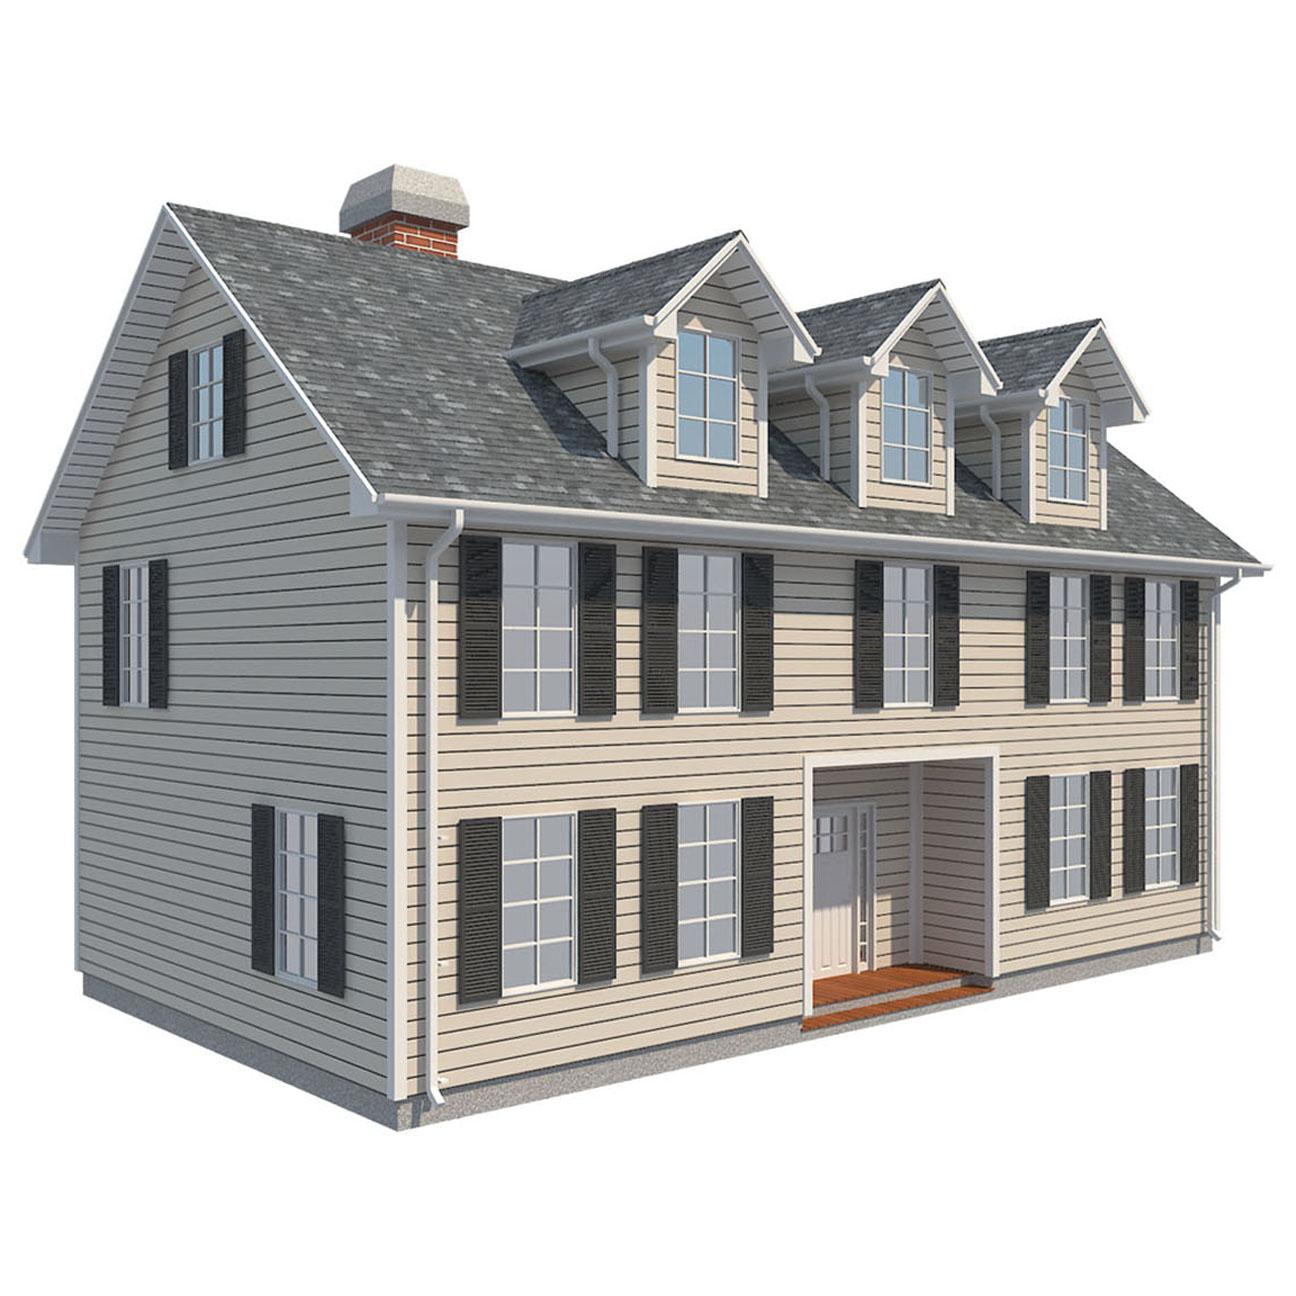 family house set collection 3d model 3ds max  fbx obj 270236